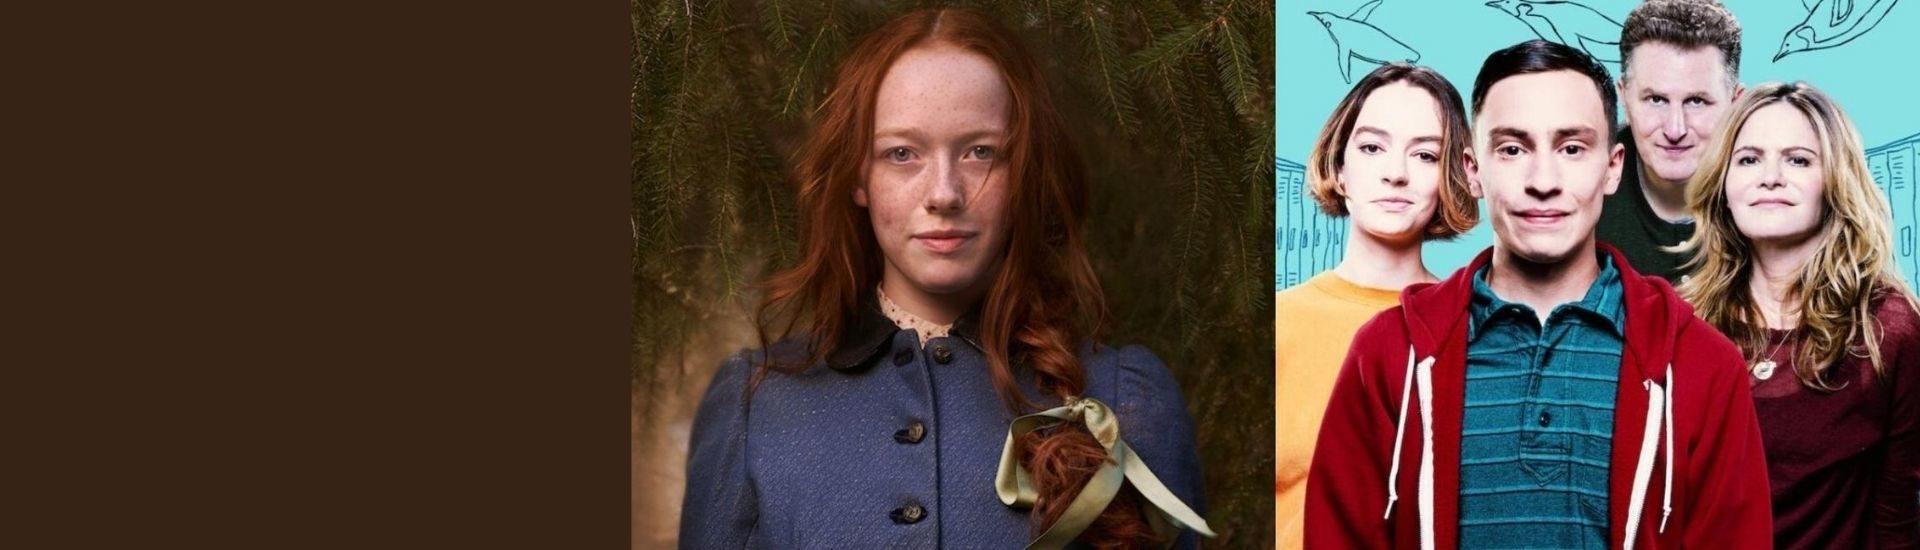 Imagen donde sale foto promocional de las series Anne with an E y Atypical